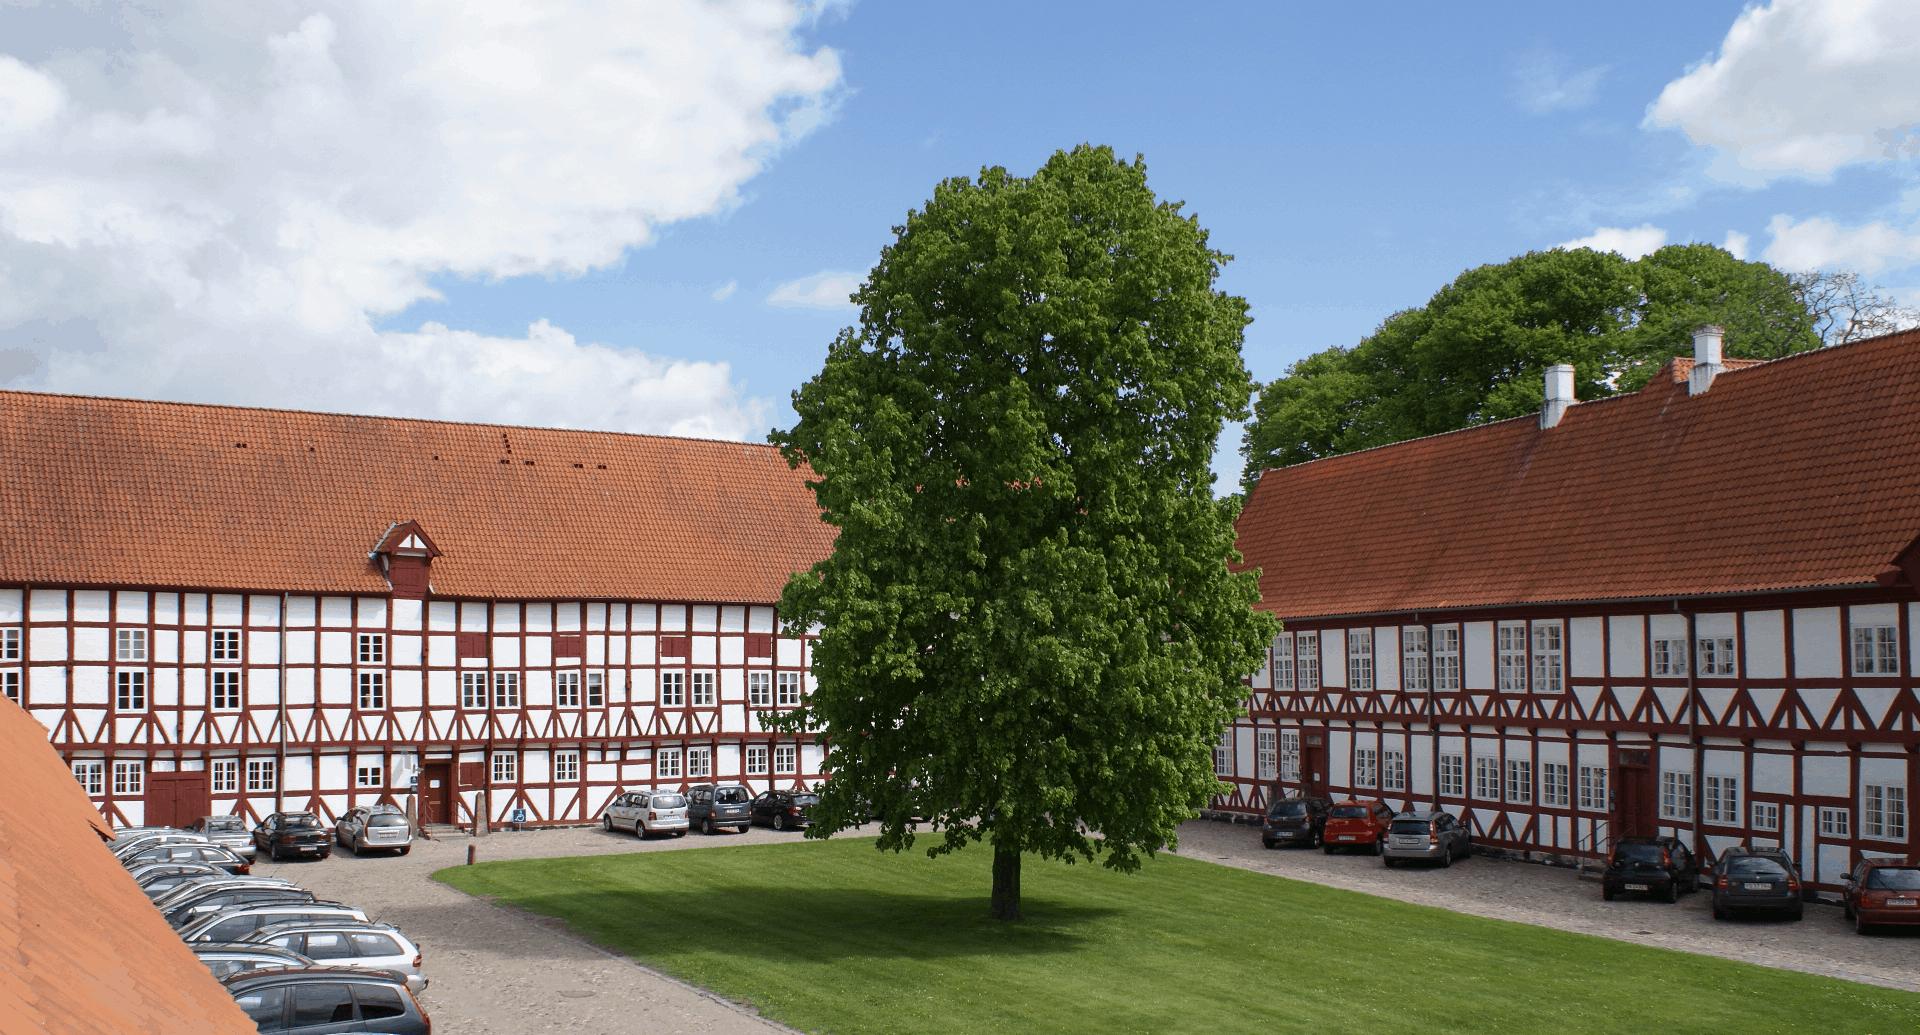 Aalborghus Slot